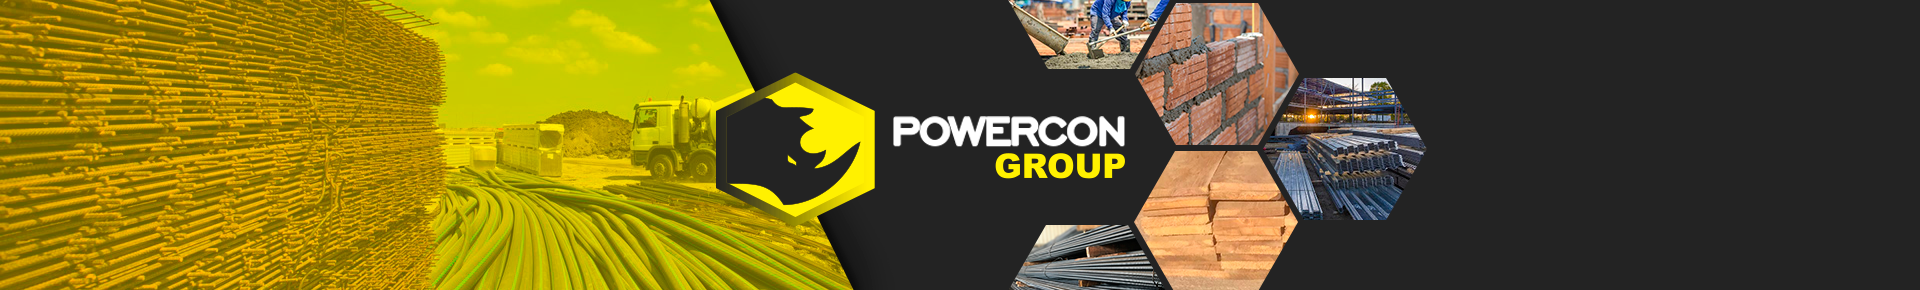 POWERCON GROUP